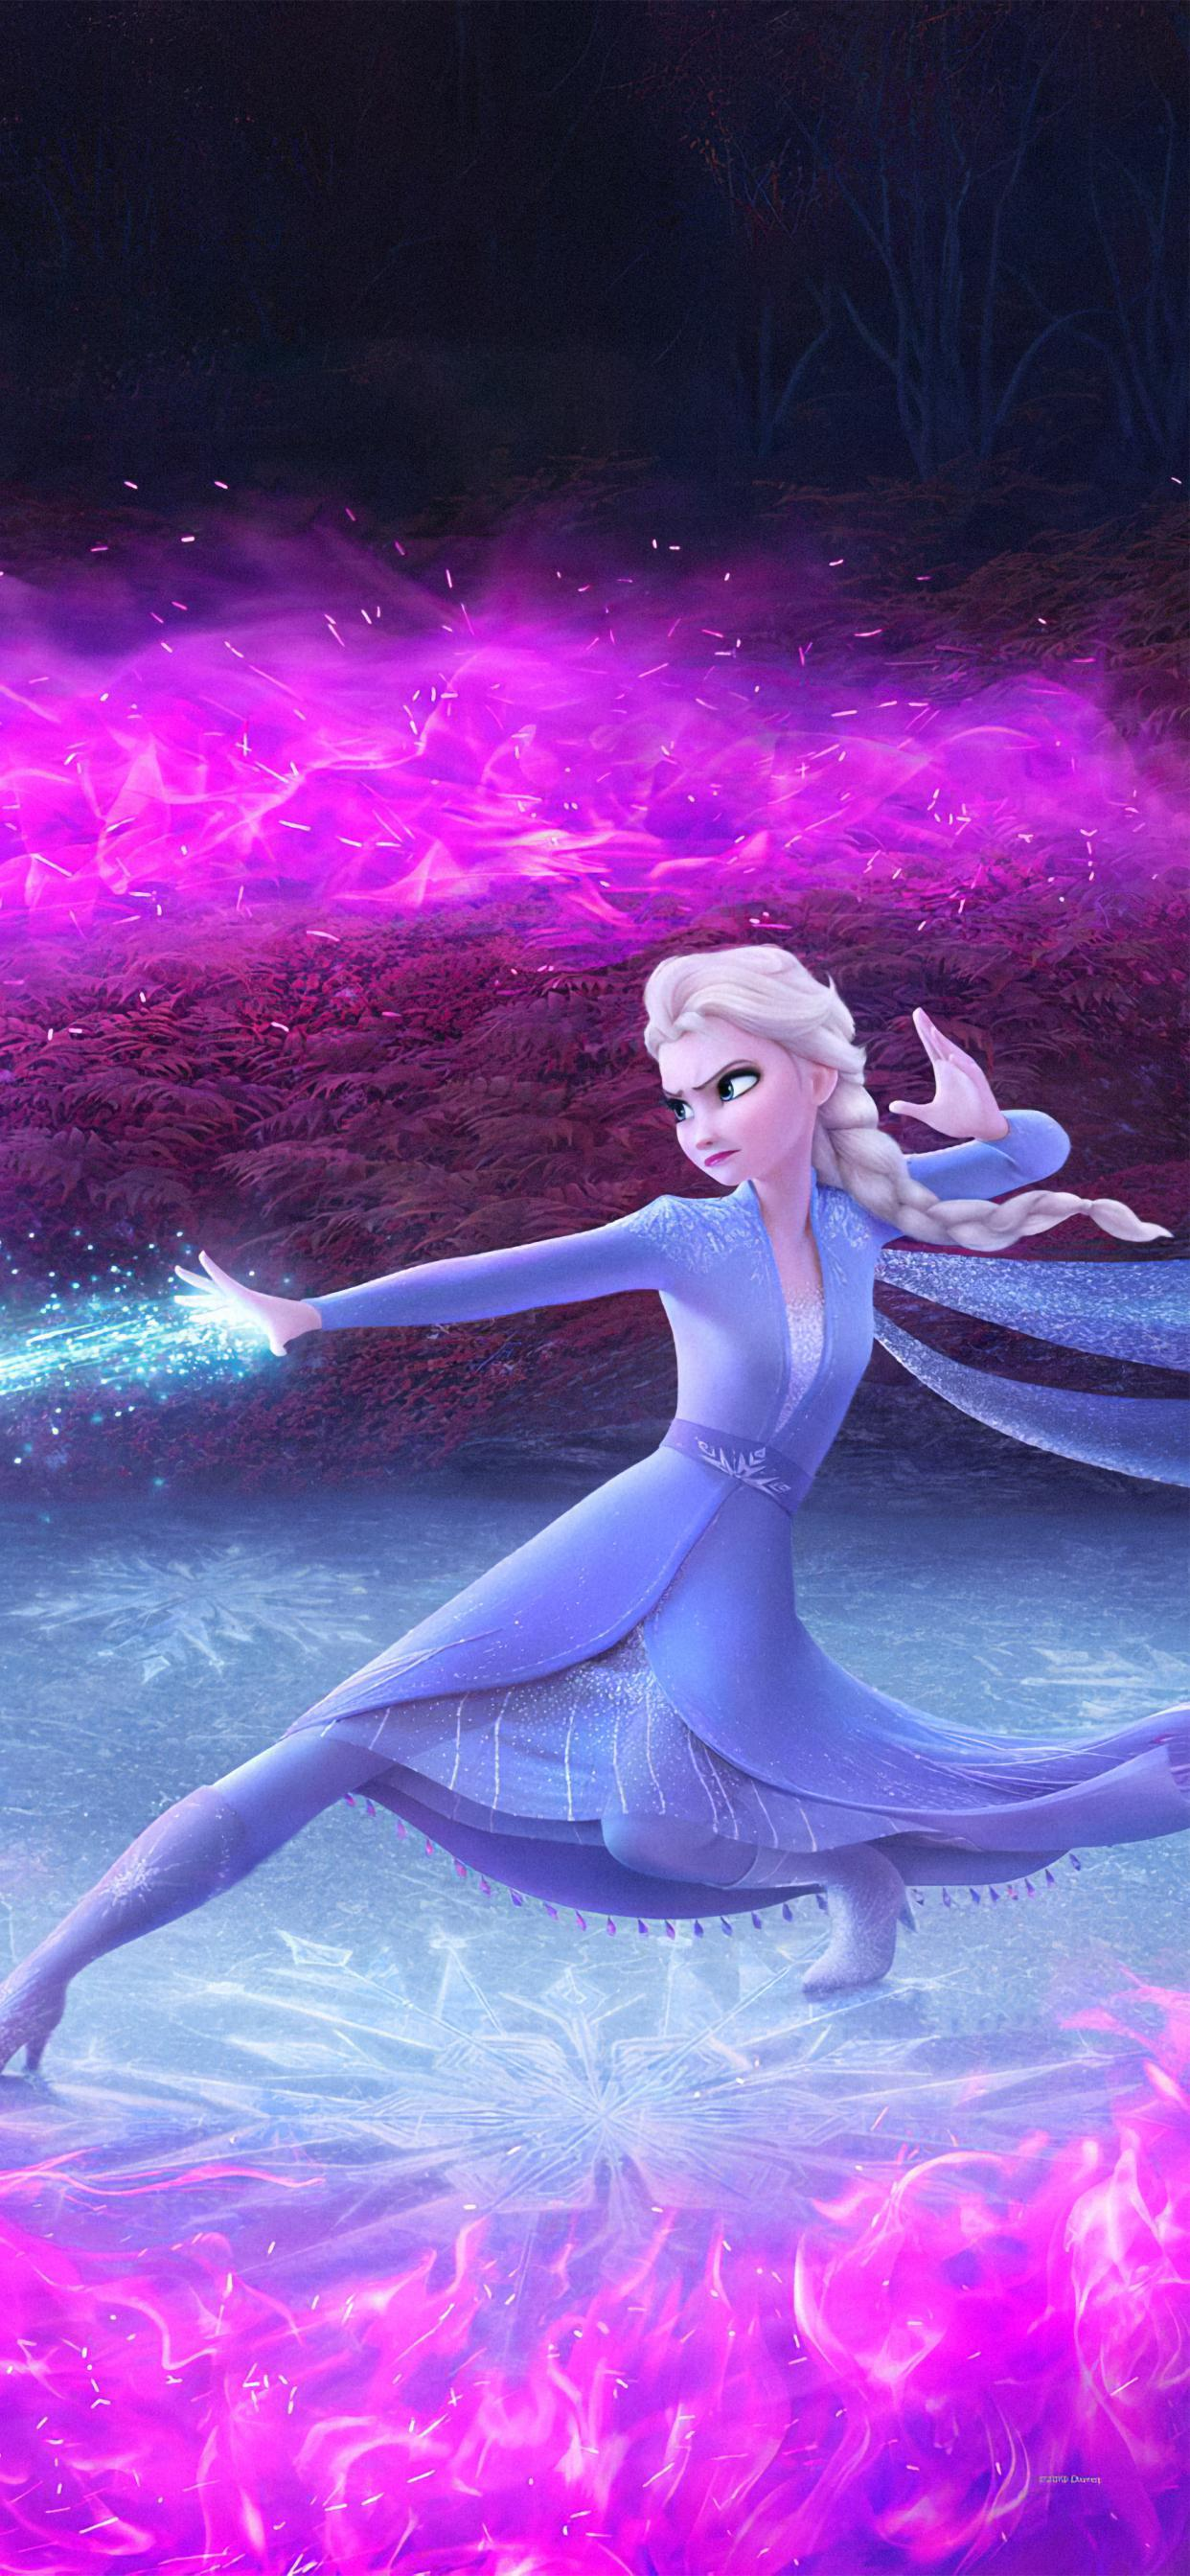 Elsa Frozen 2 Phone Wallpapers Wallpaper Cave